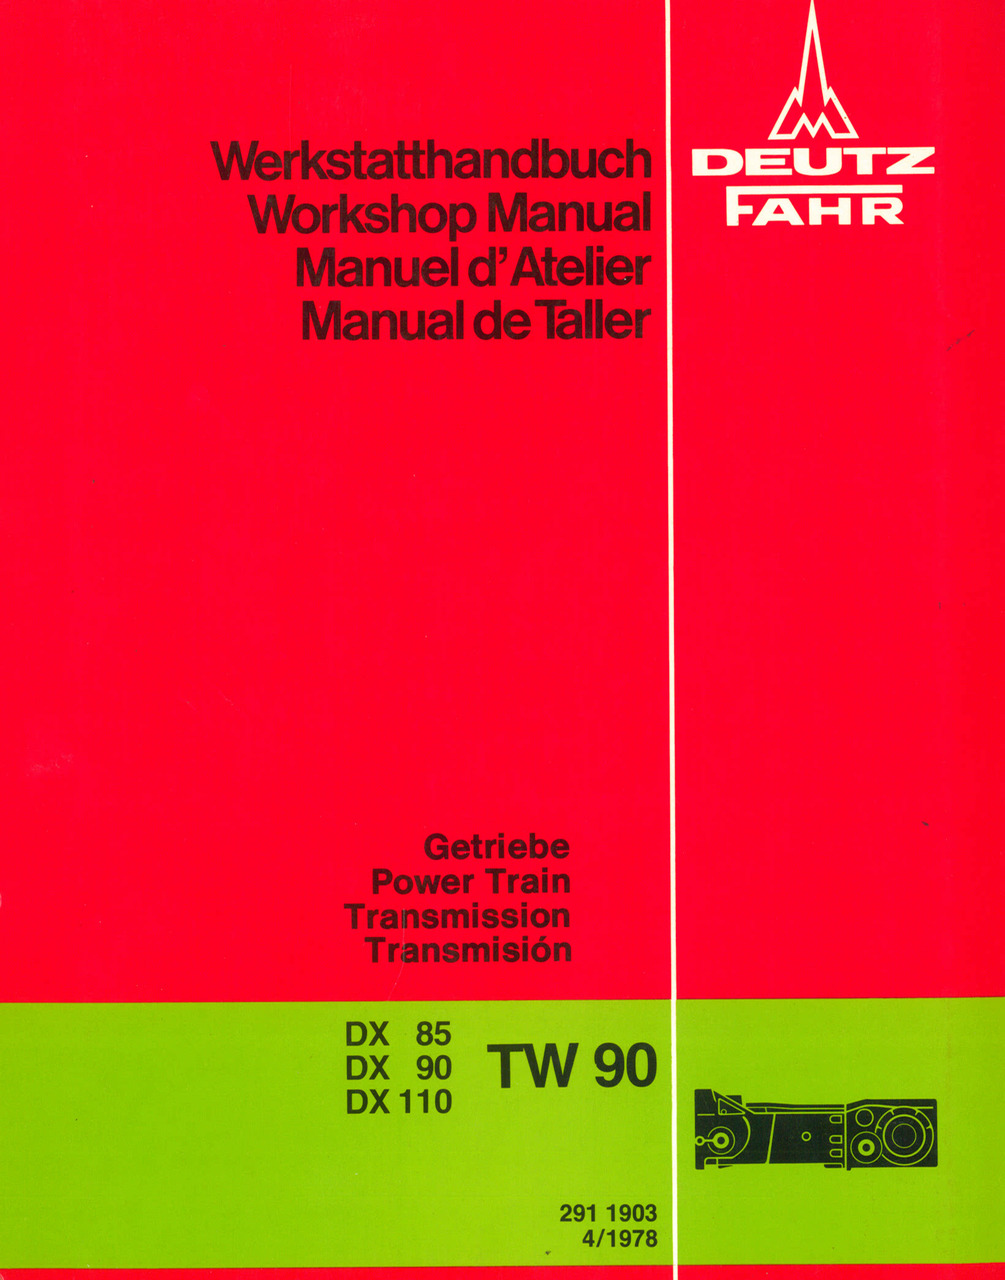 sdf archivio storico e museo rh archiviostorico sdfgroup com Deutz-Fahr 6806 4WD Deutz-Fahr Tractor 4